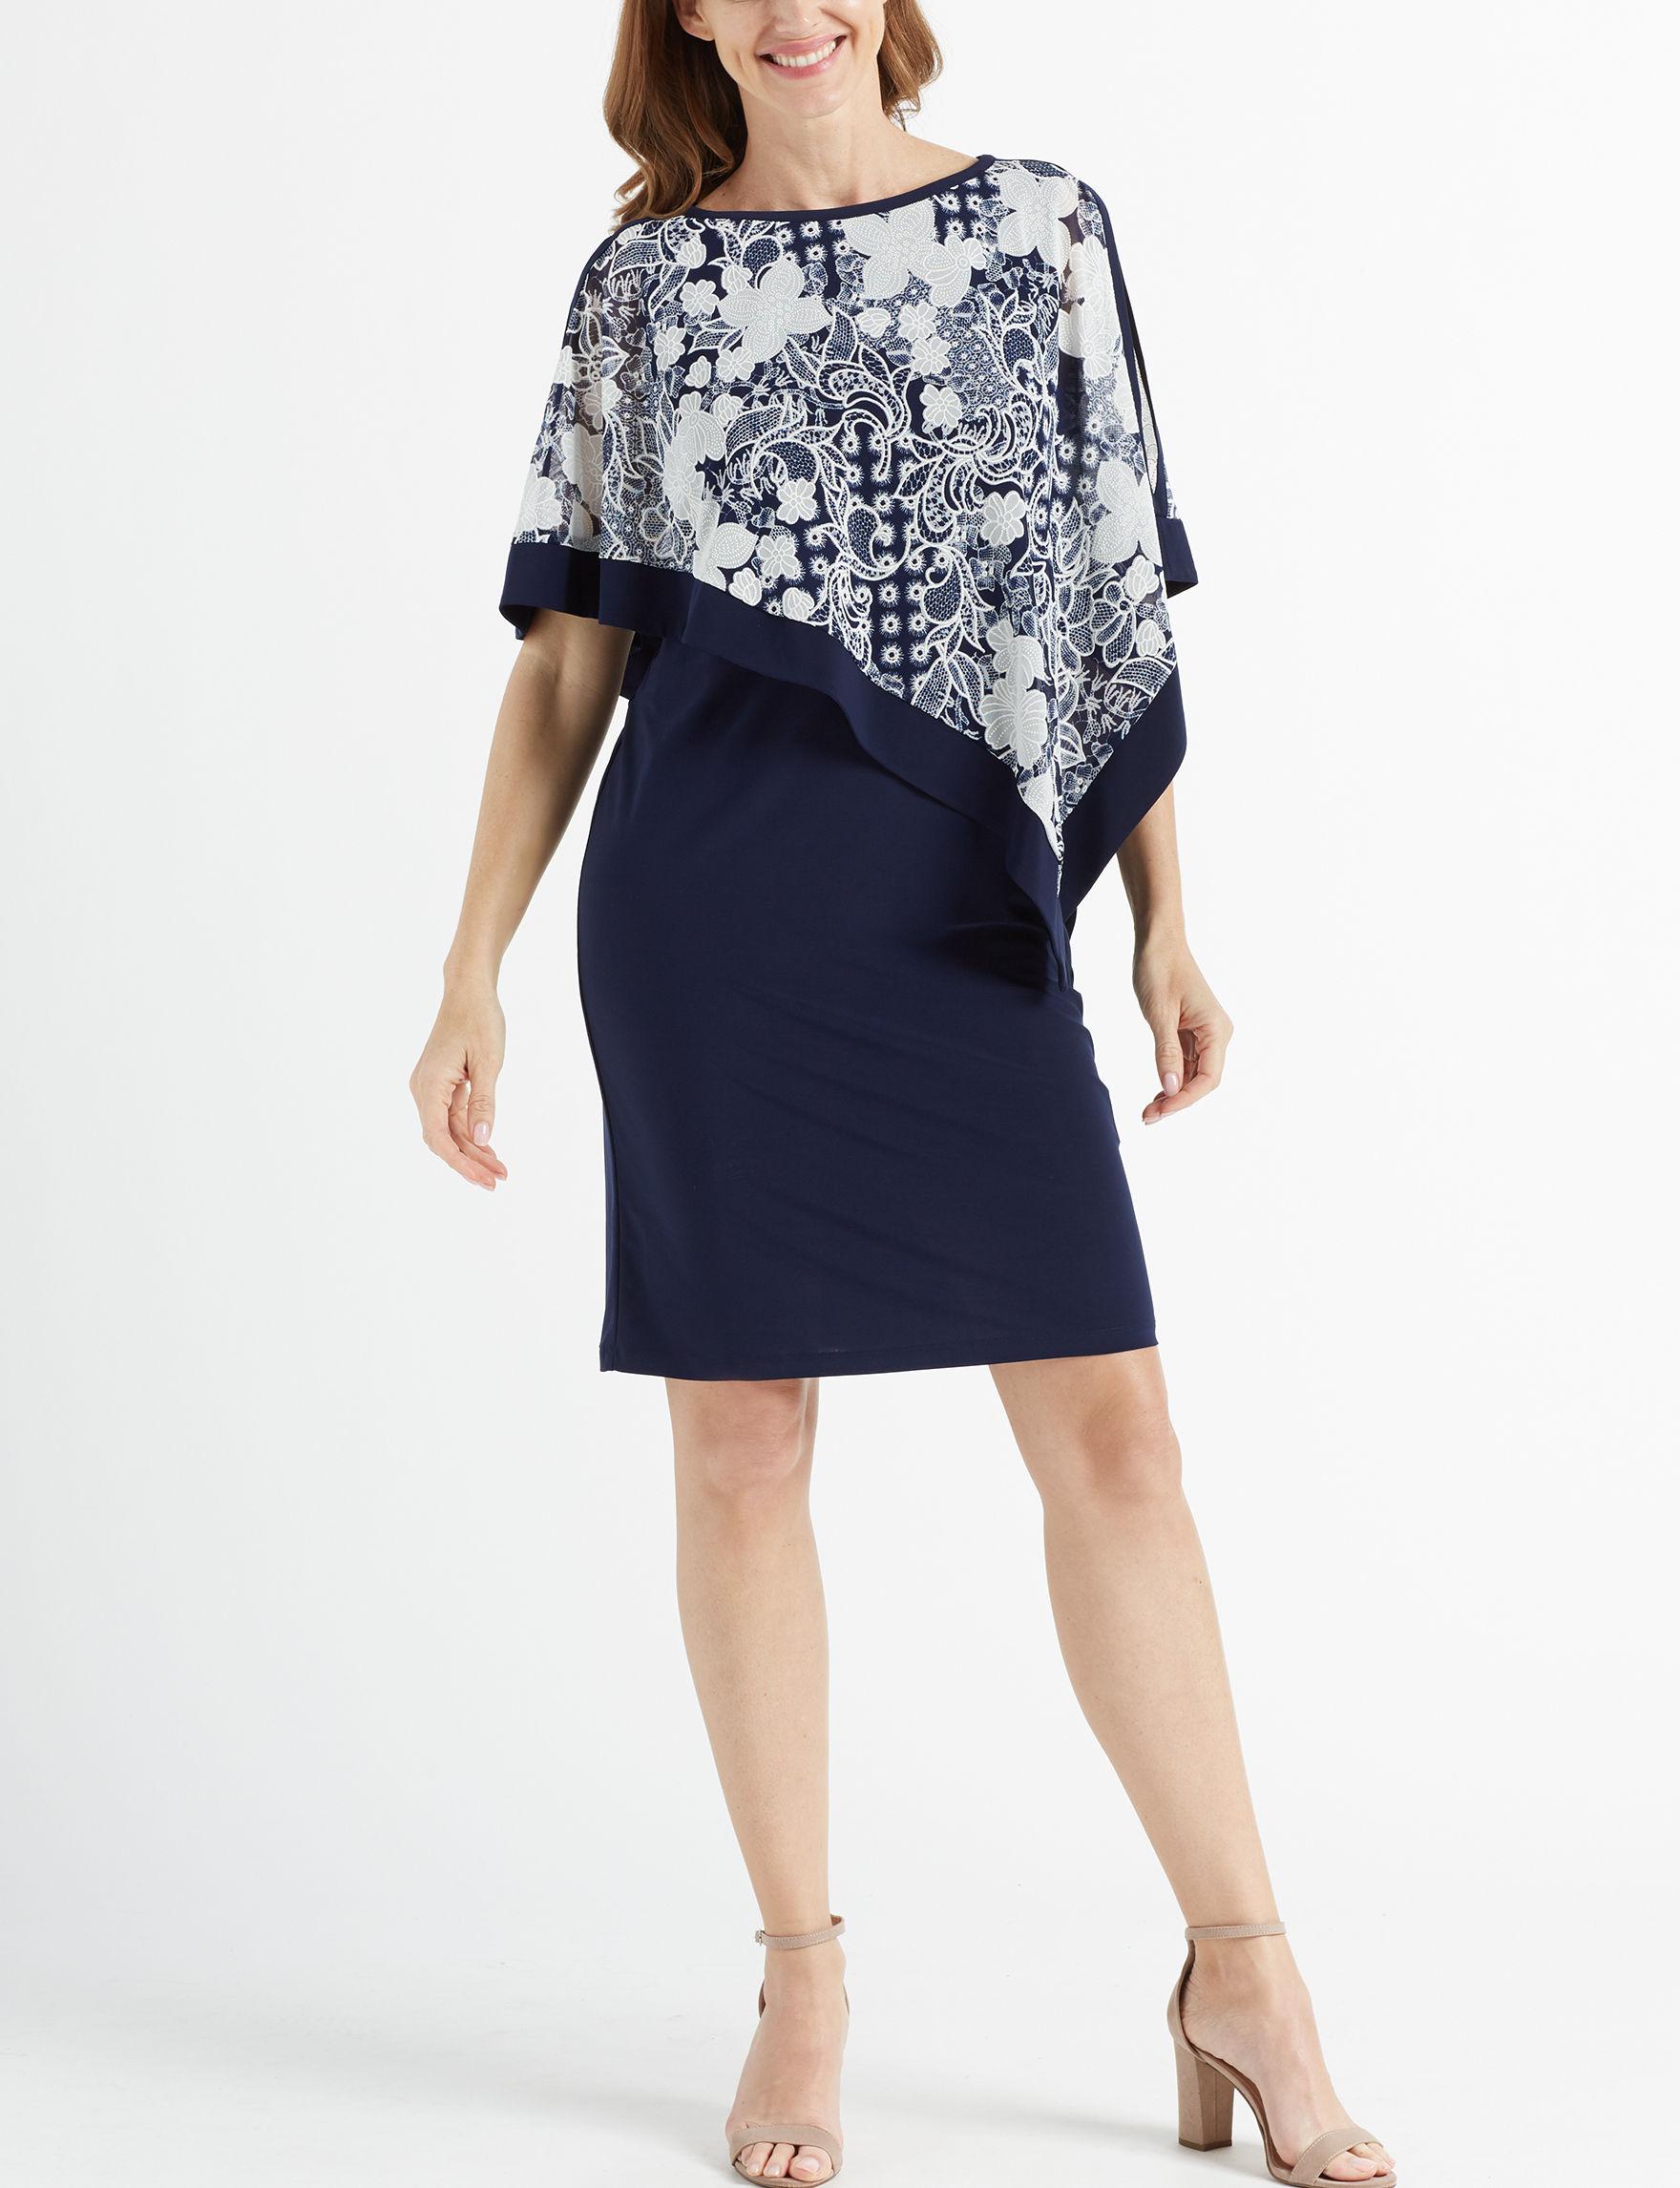 R & M Richards Navy / White Everyday & Casual Jacket Dresses